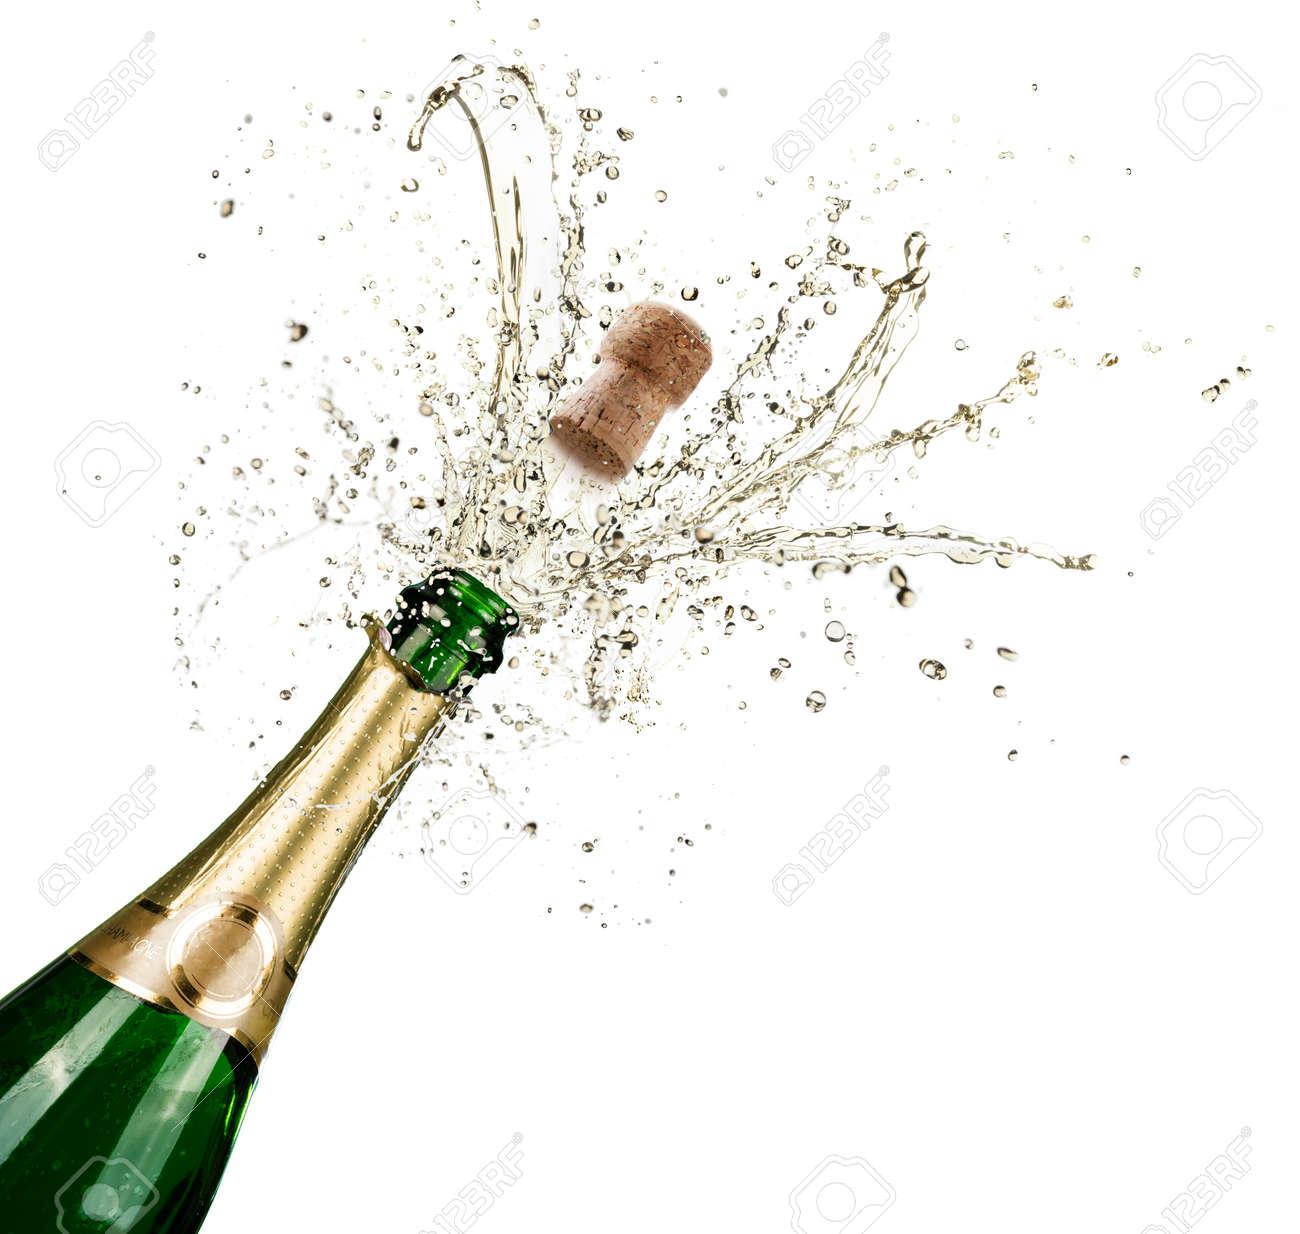 Celebration With Splashes Of Champagne - 90956438